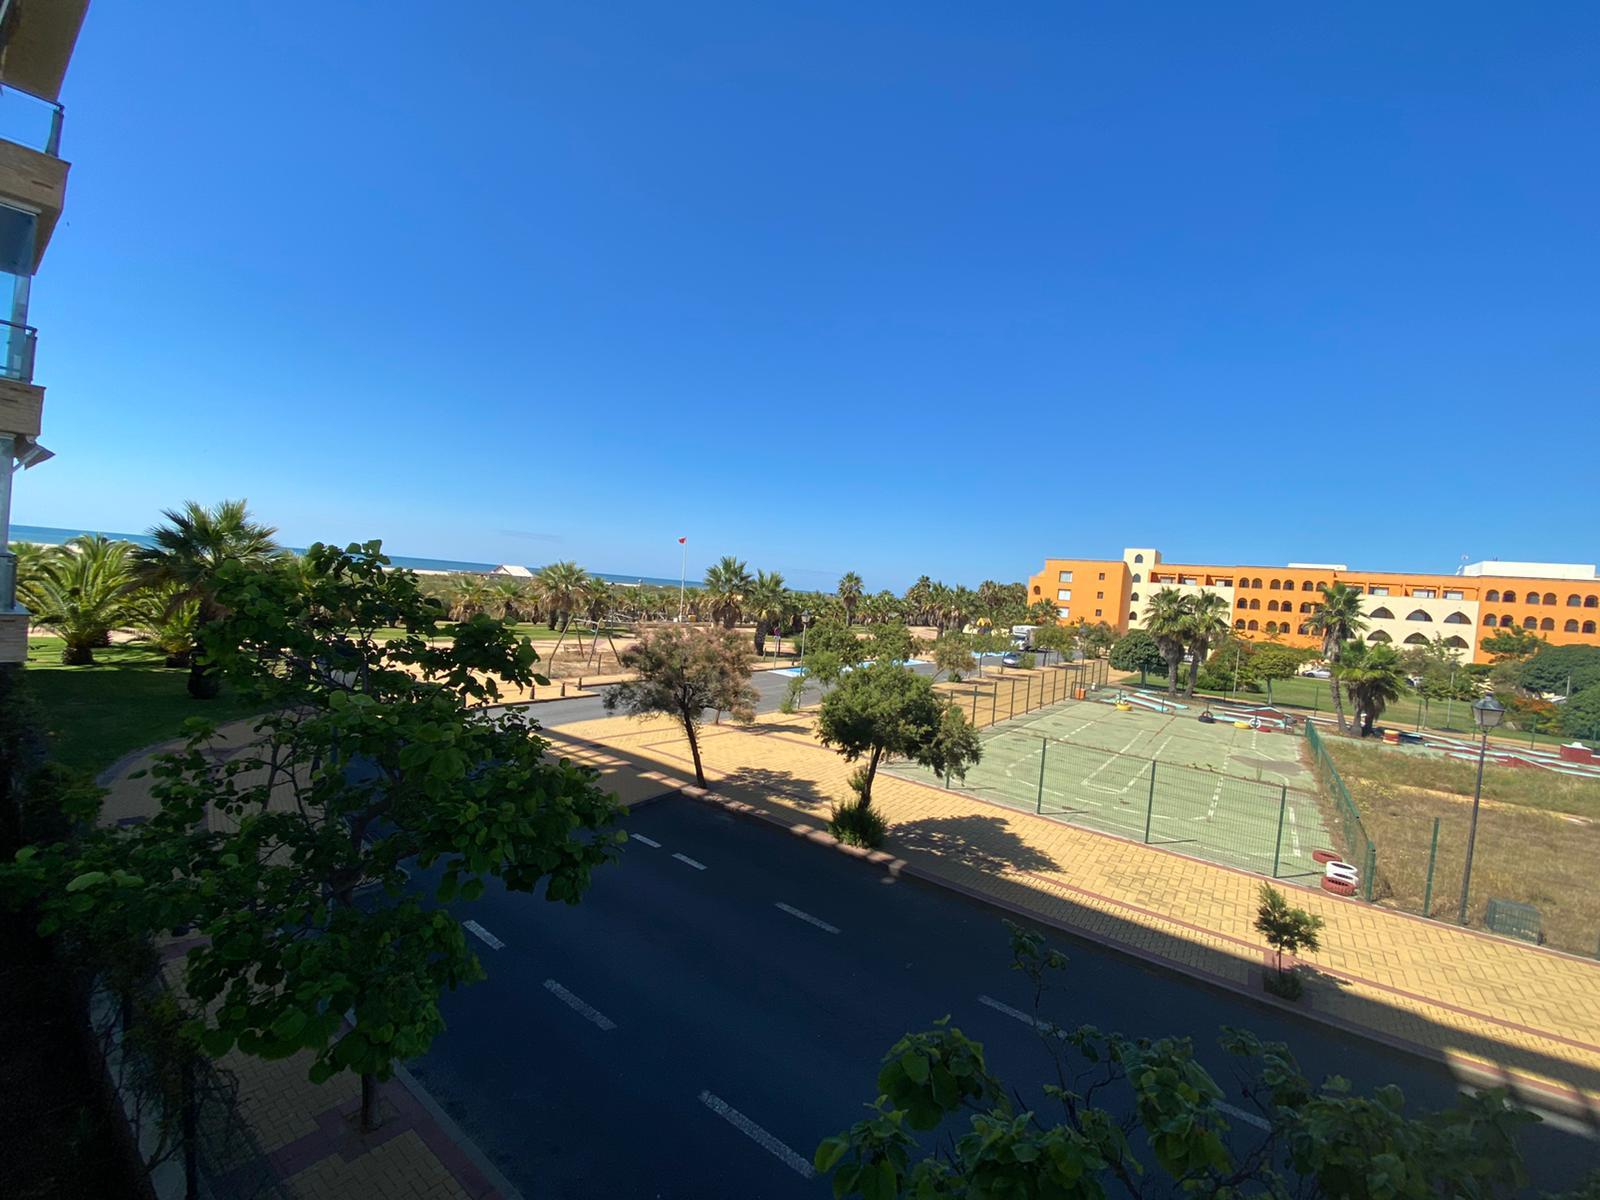 Imagen 27 del Apartamento en El Espigón, 1ª Planta nº4 Poniente (3d+2b), Punta del Moral (HUELVA), Paseo de la Cruz nº22